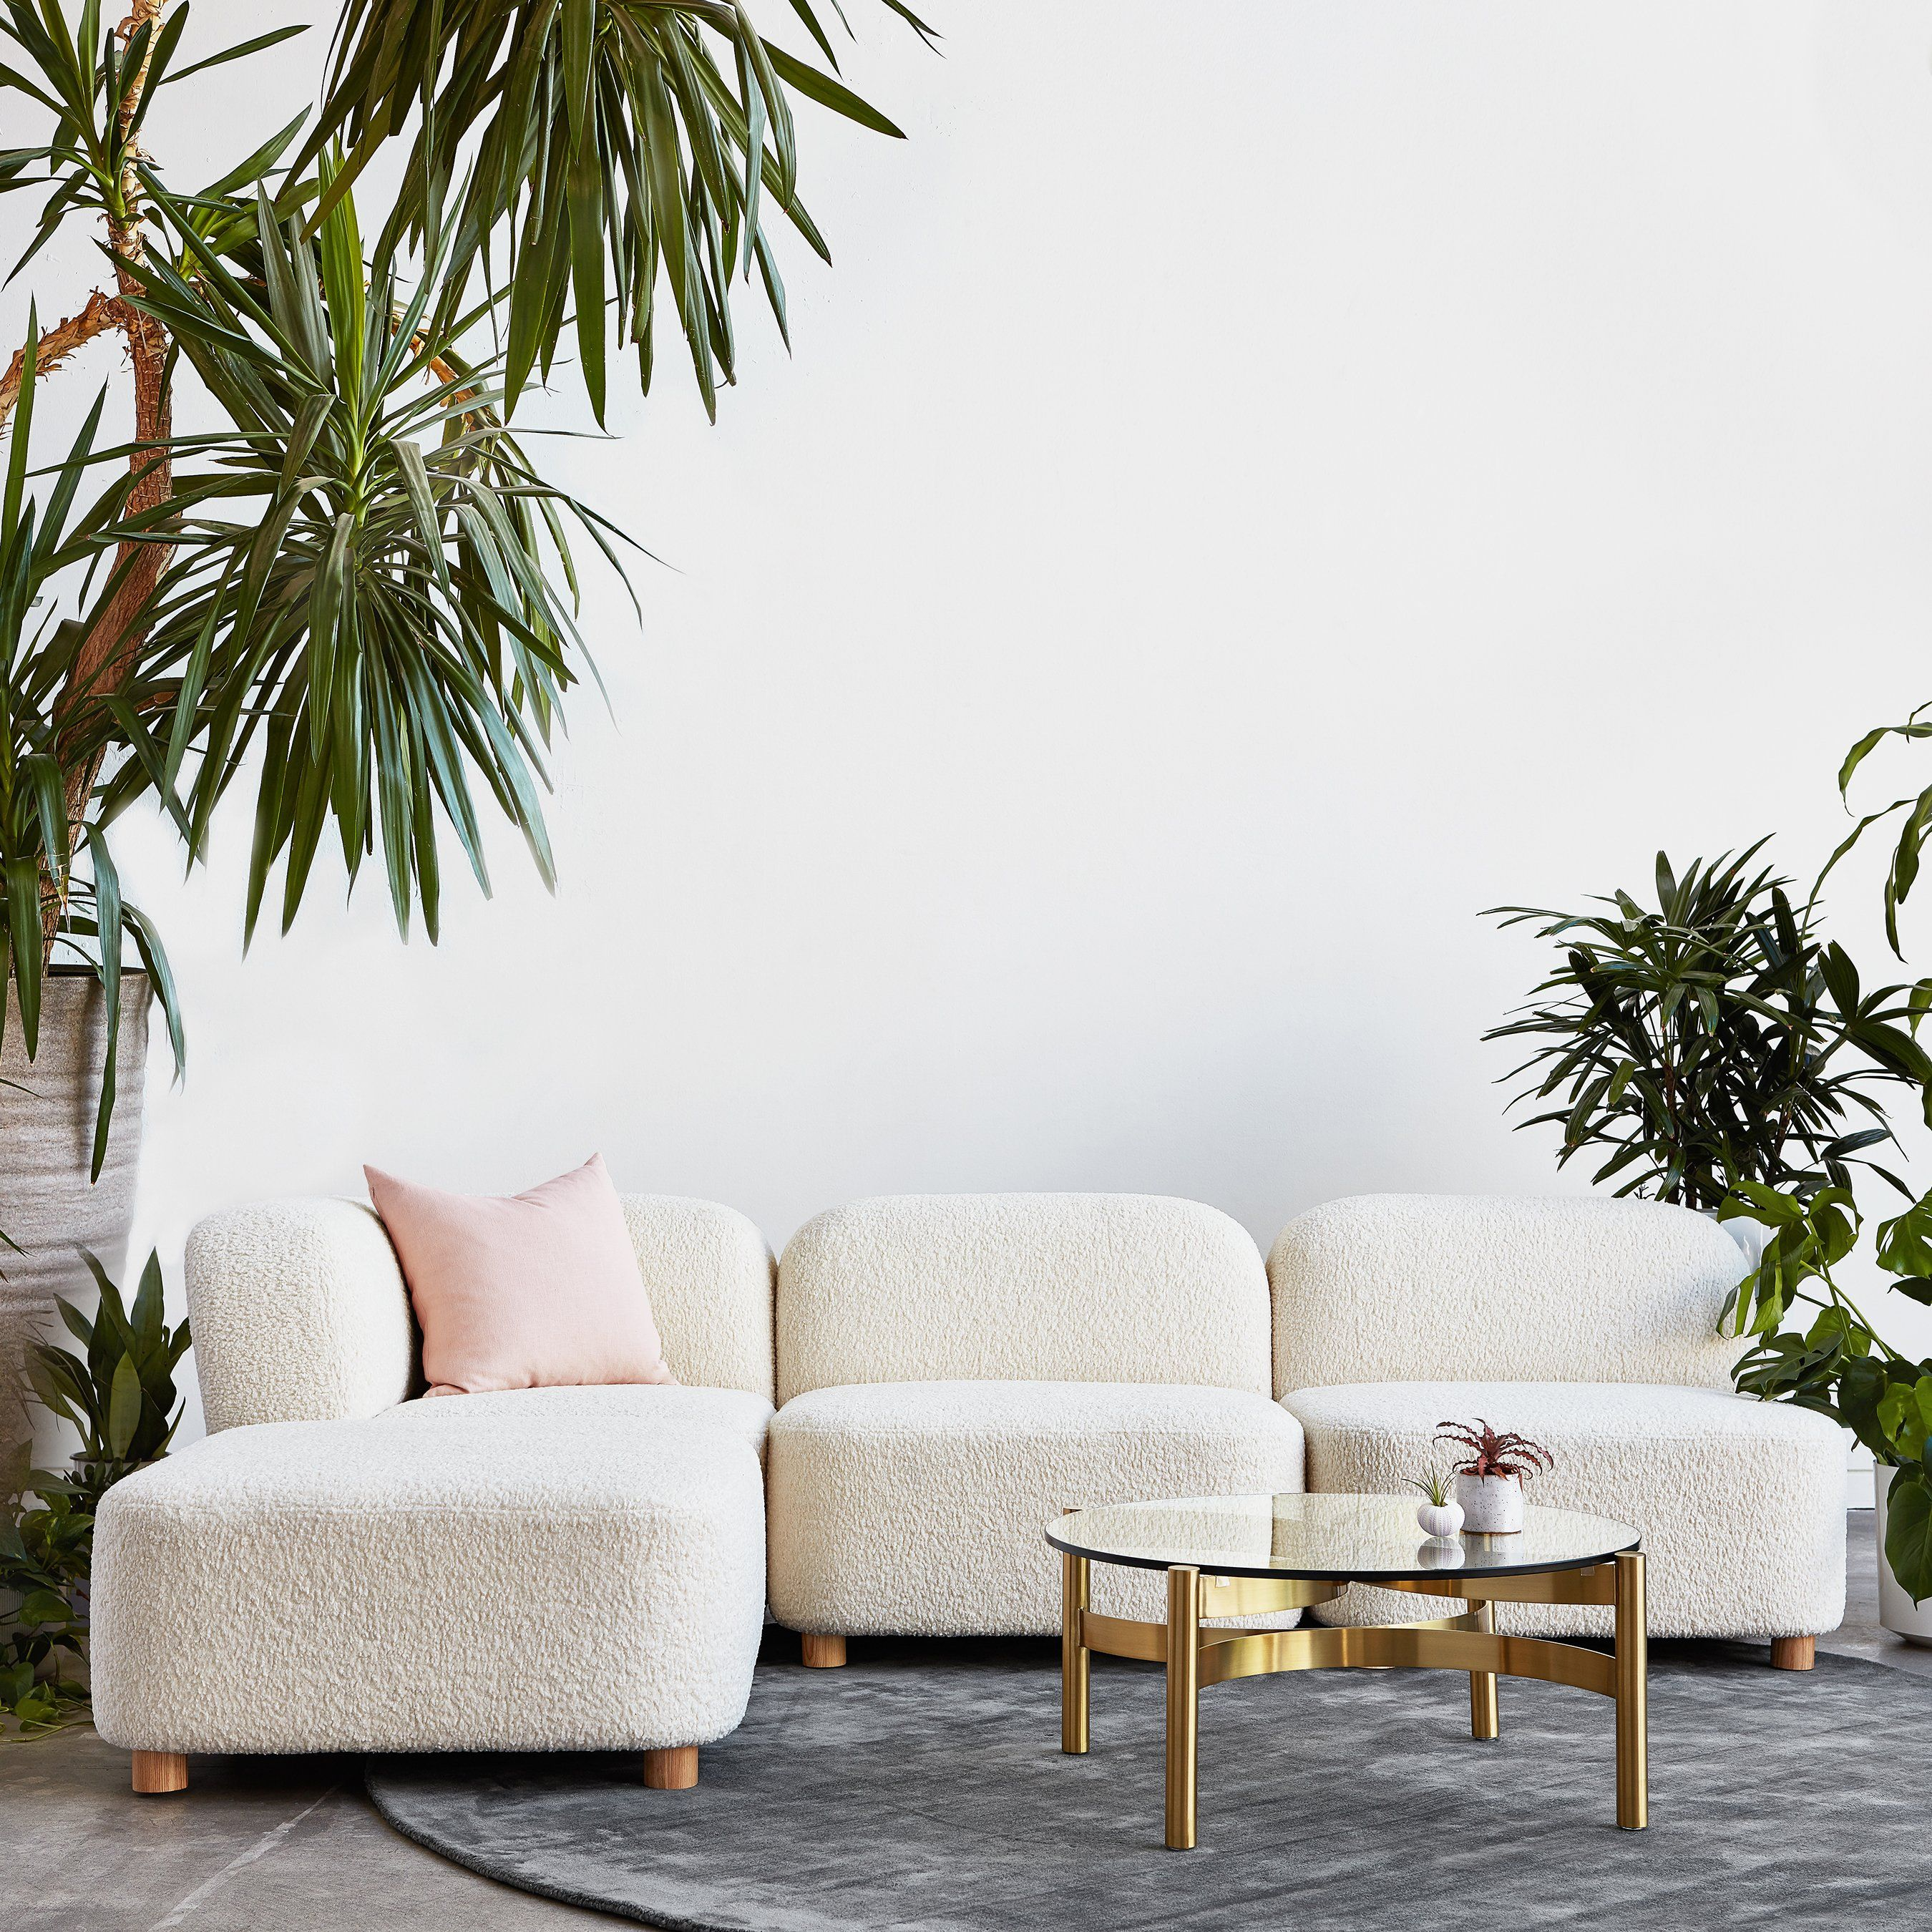 Circuit Modular 4 Piece Sectional Sofa In 2020 Gus Modern Contemporary Seating Modular Sectional